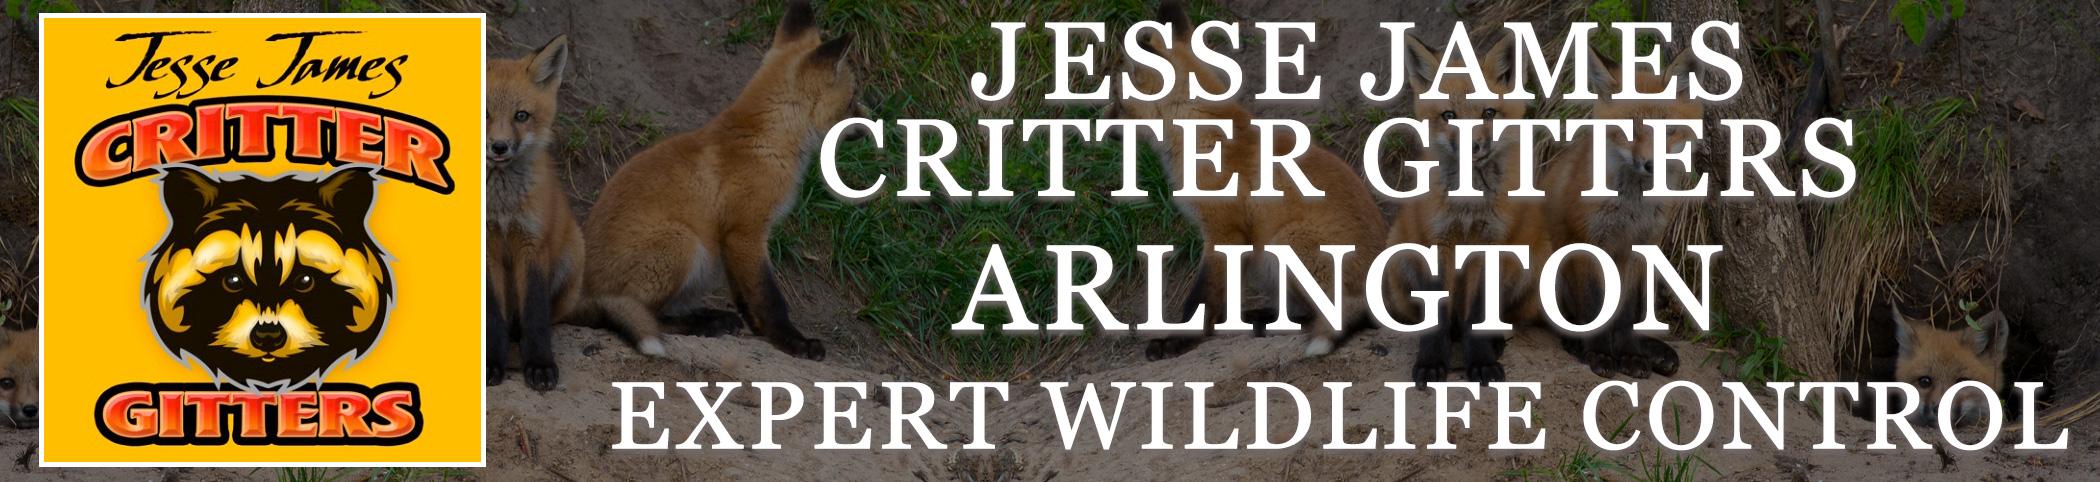 Critter_Gitters_header_ARLINGTON_VA